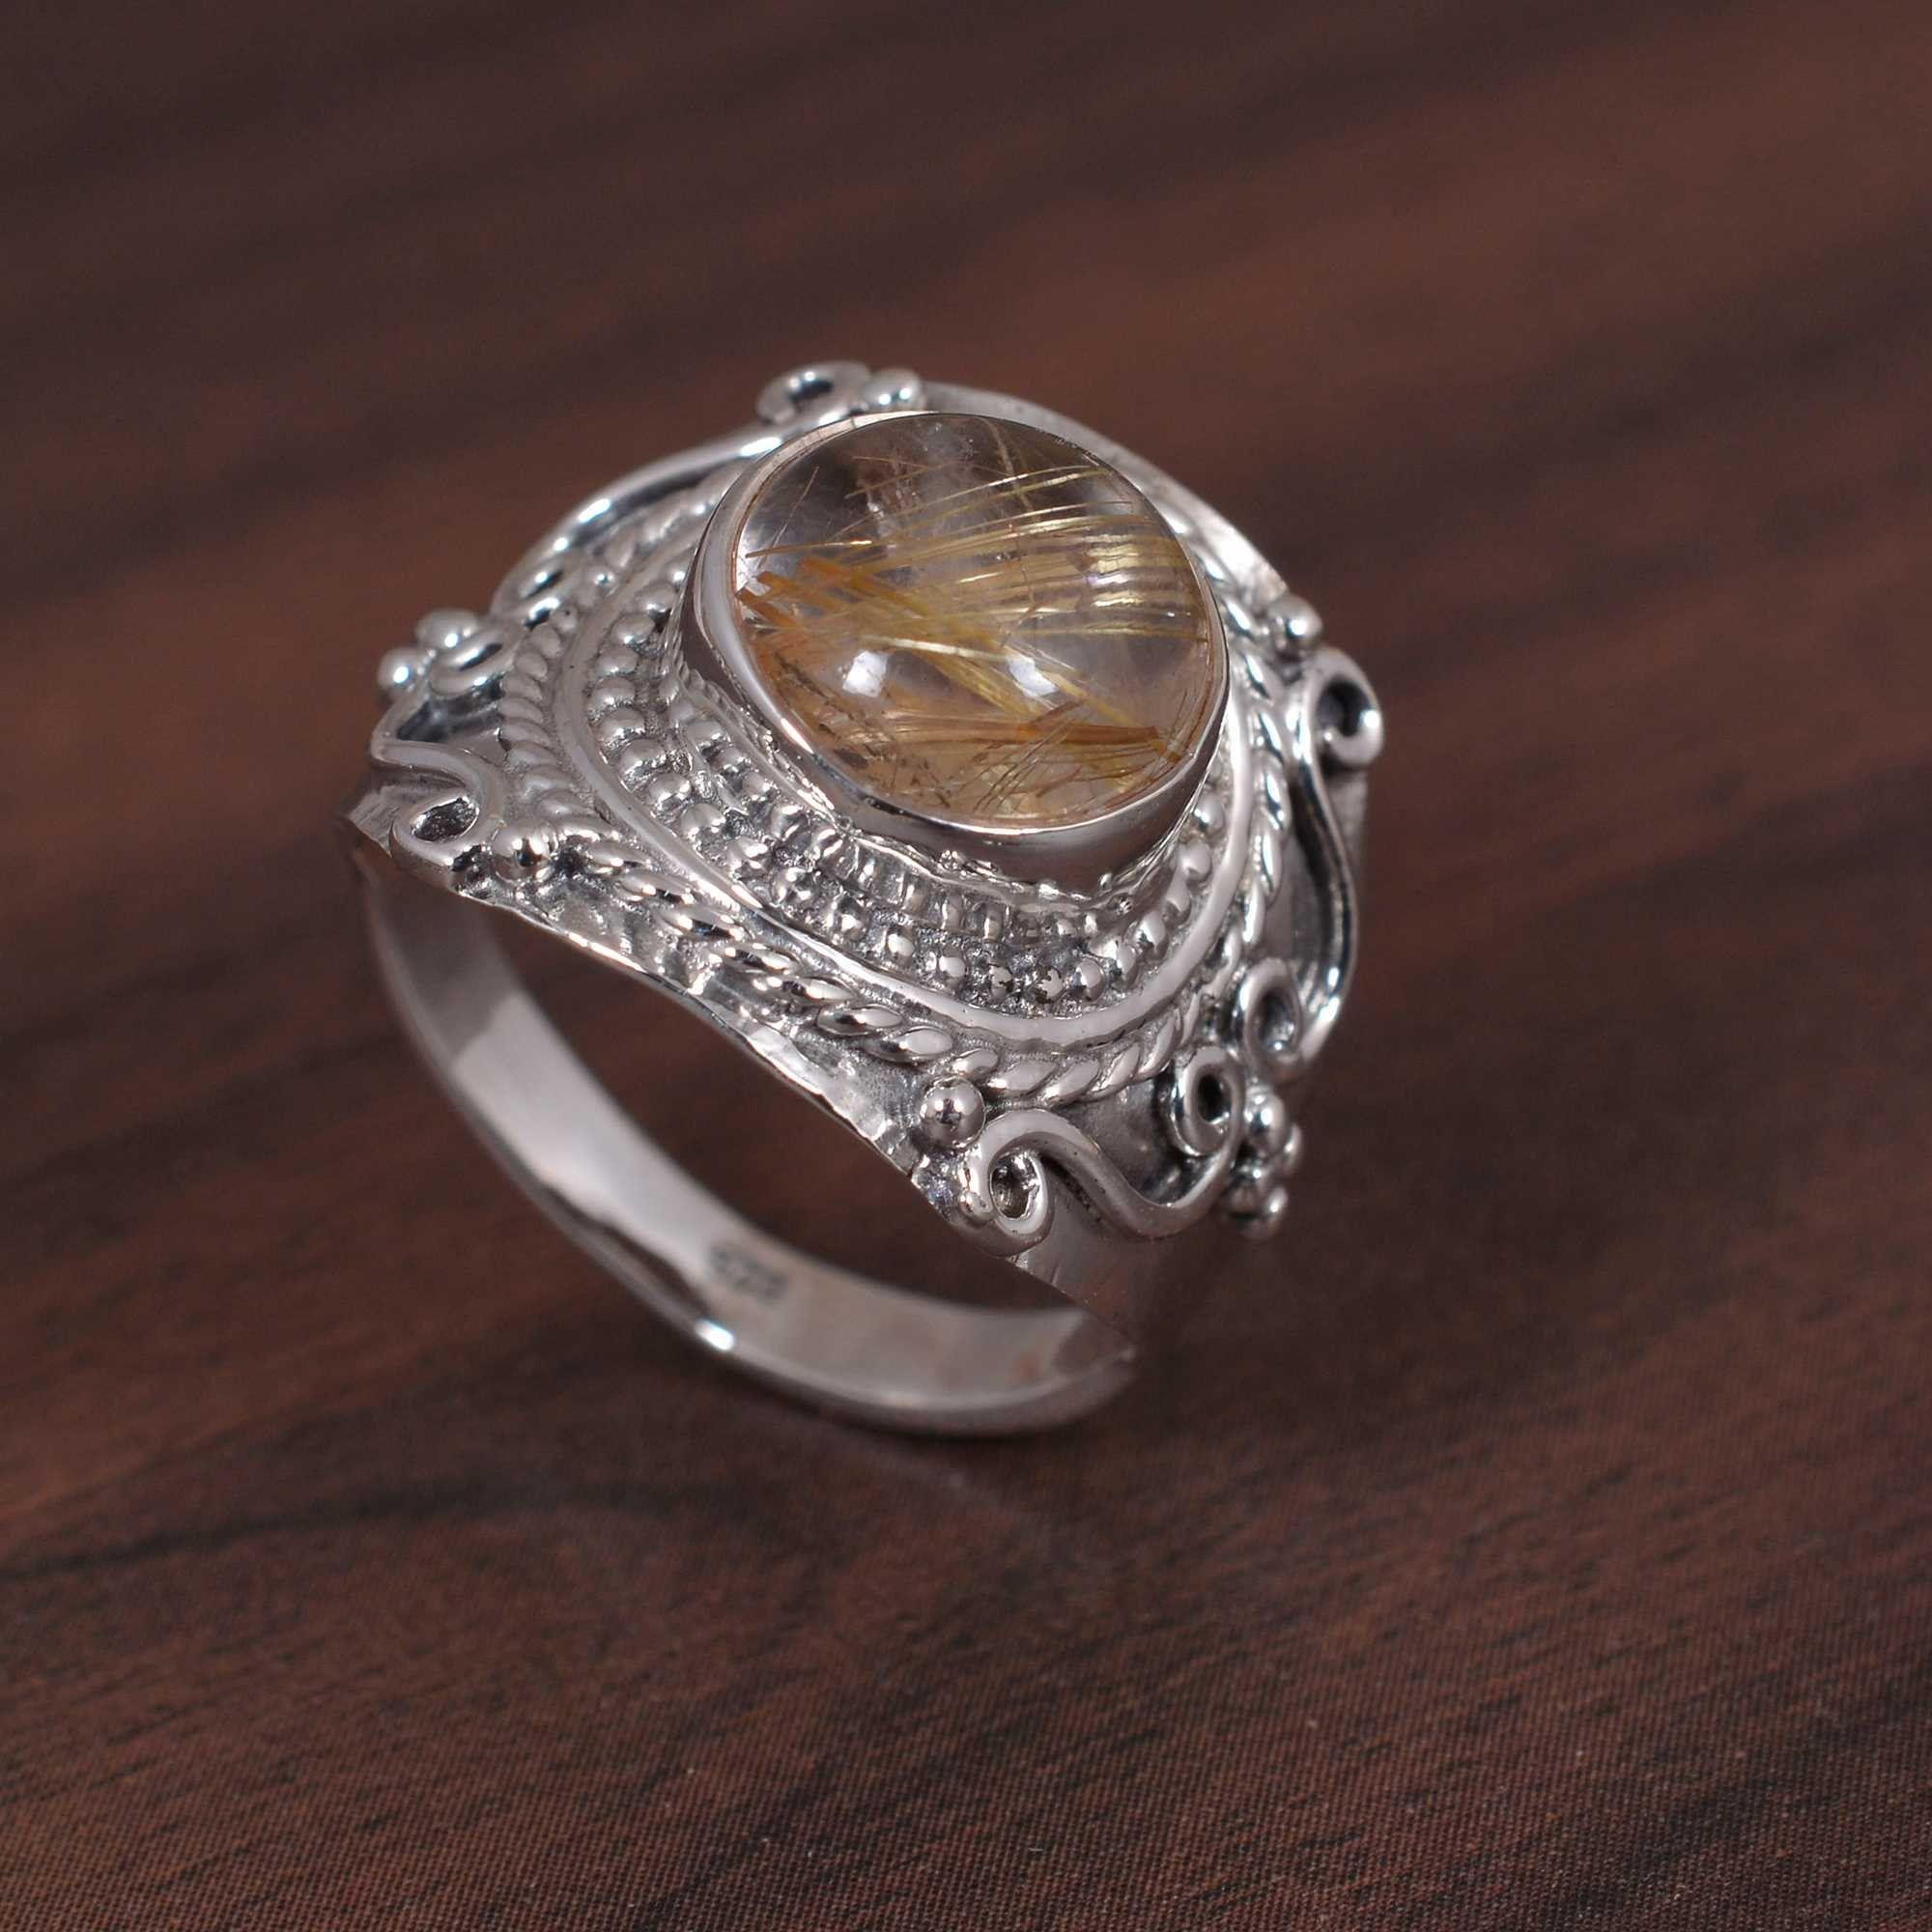 Golden Rutile Ring,Brass Ring,Gemstone Ring,Boho Ring,Vintage Ring,Statement Ring,Personalized Ring,Promise Ring,Unique Ring,Wedding Ring